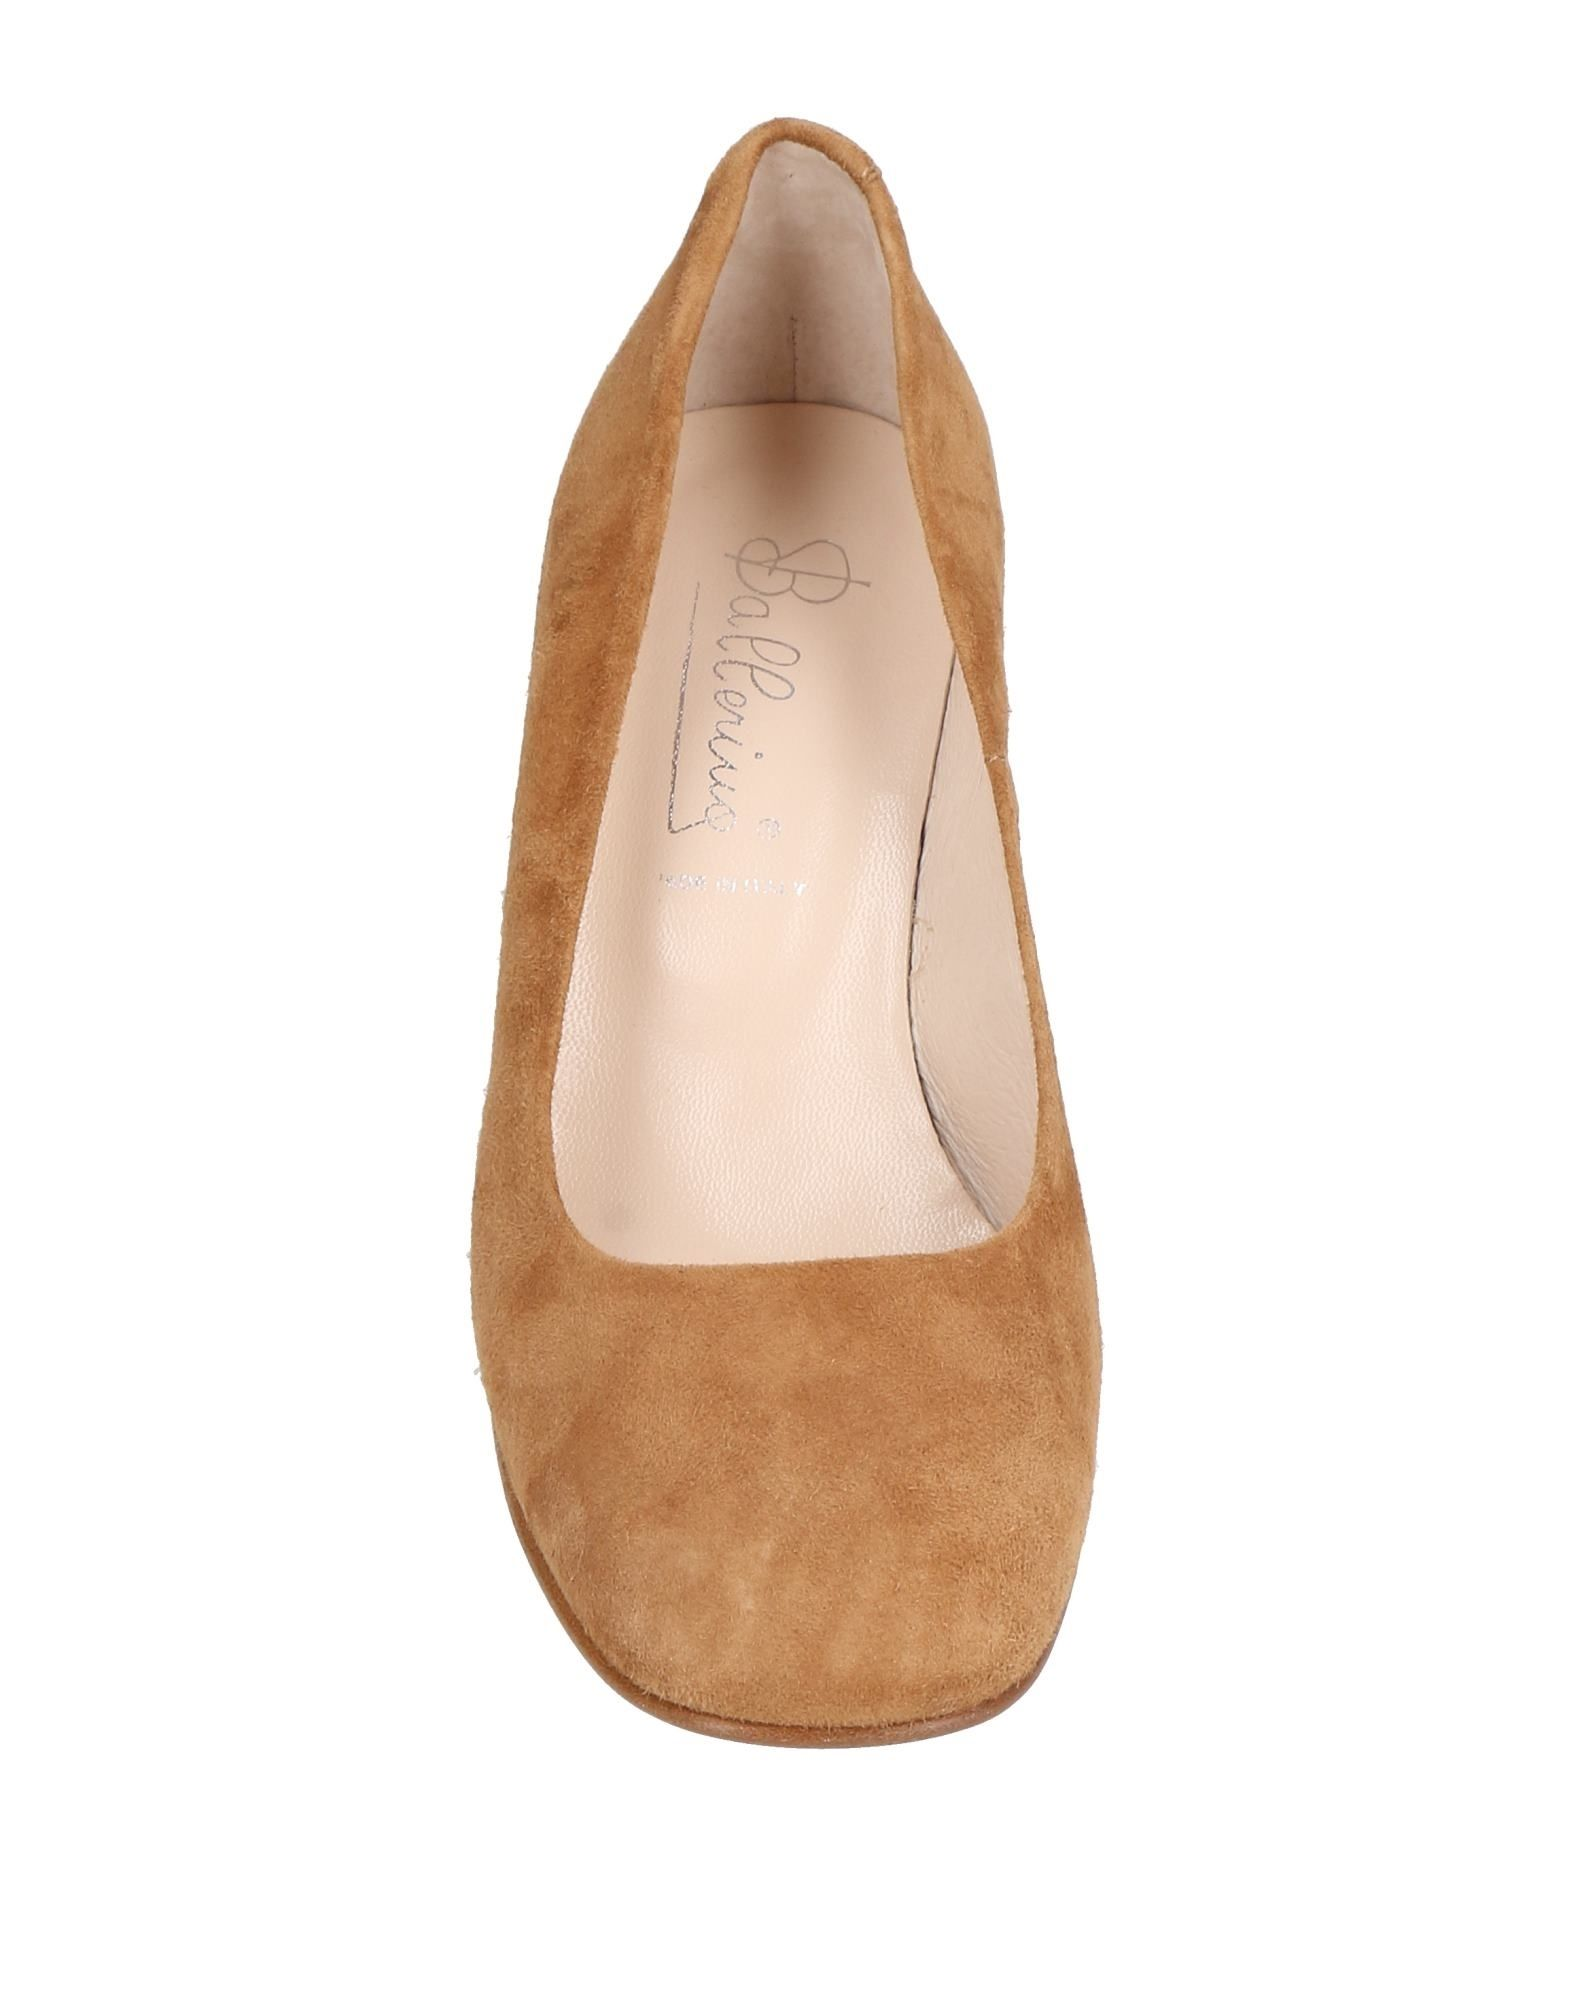 Haltbare Mode billige Schuhe Ballerina Pumps Damen  11475042PI Heiße Schuhe